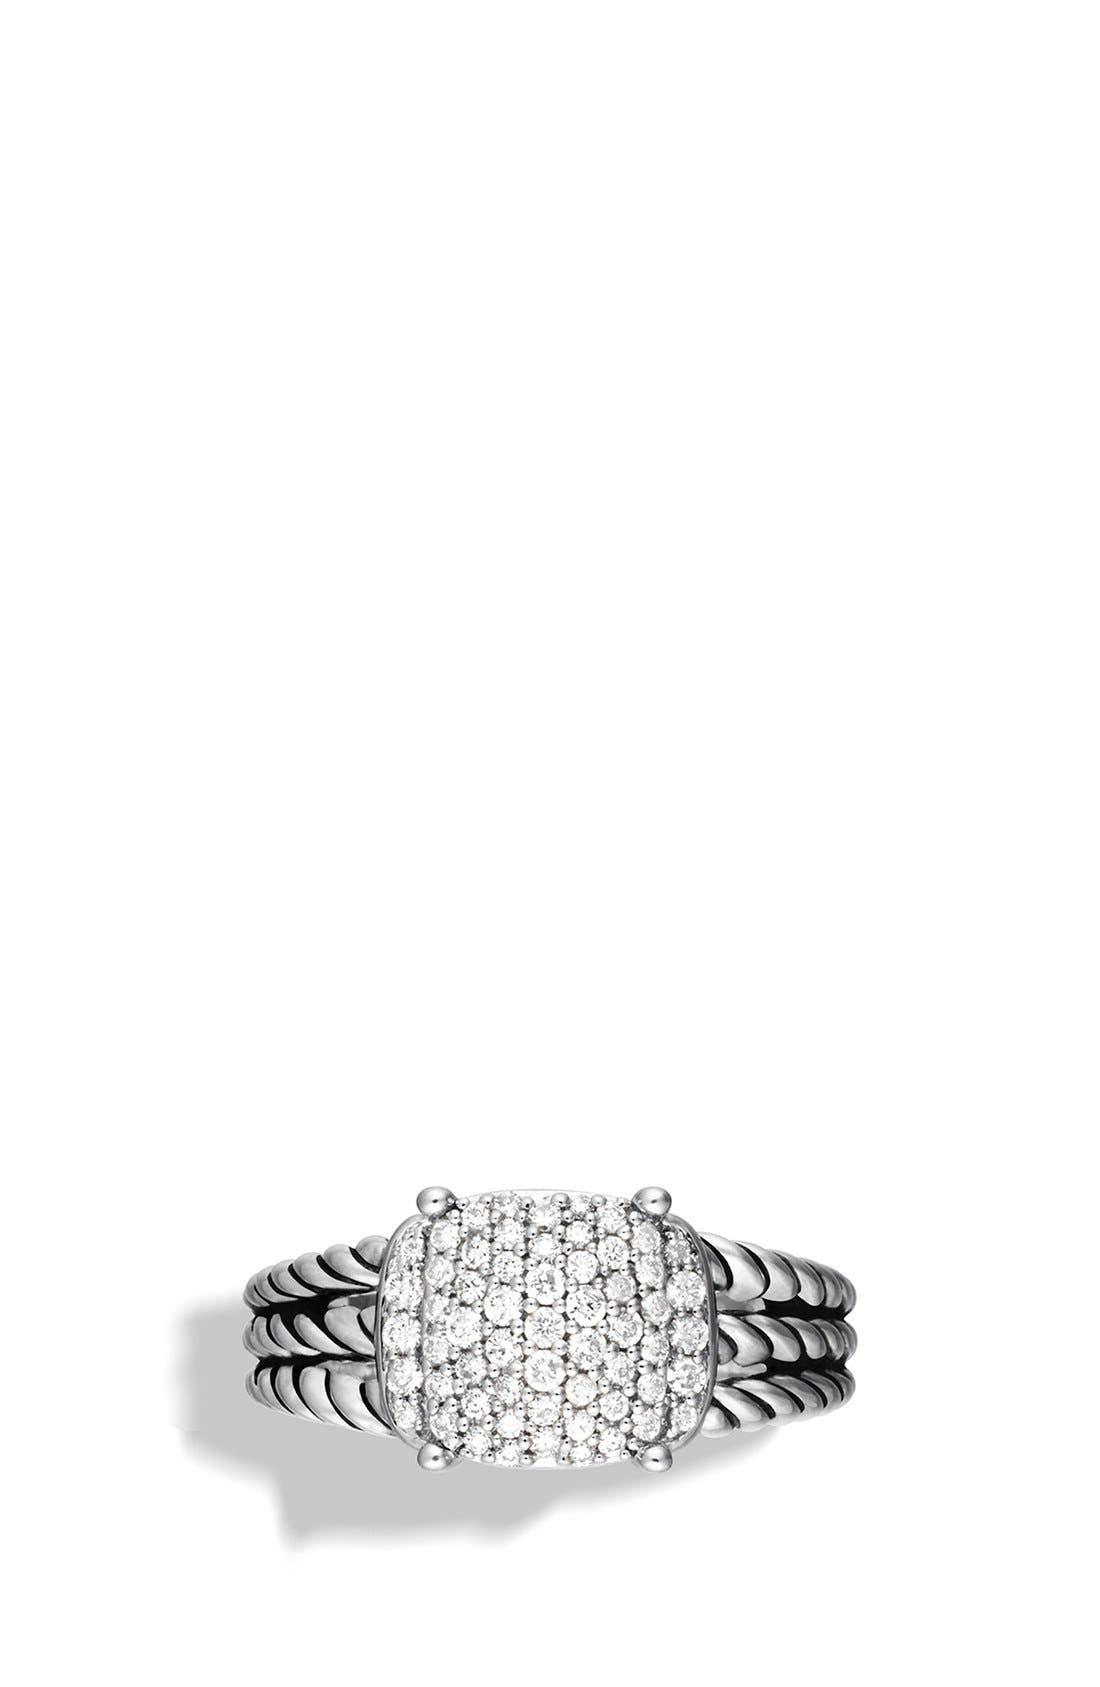 'Wheaton' Petite Ring with Diamonds,                             Alternate thumbnail 4, color,                             DIAMOND